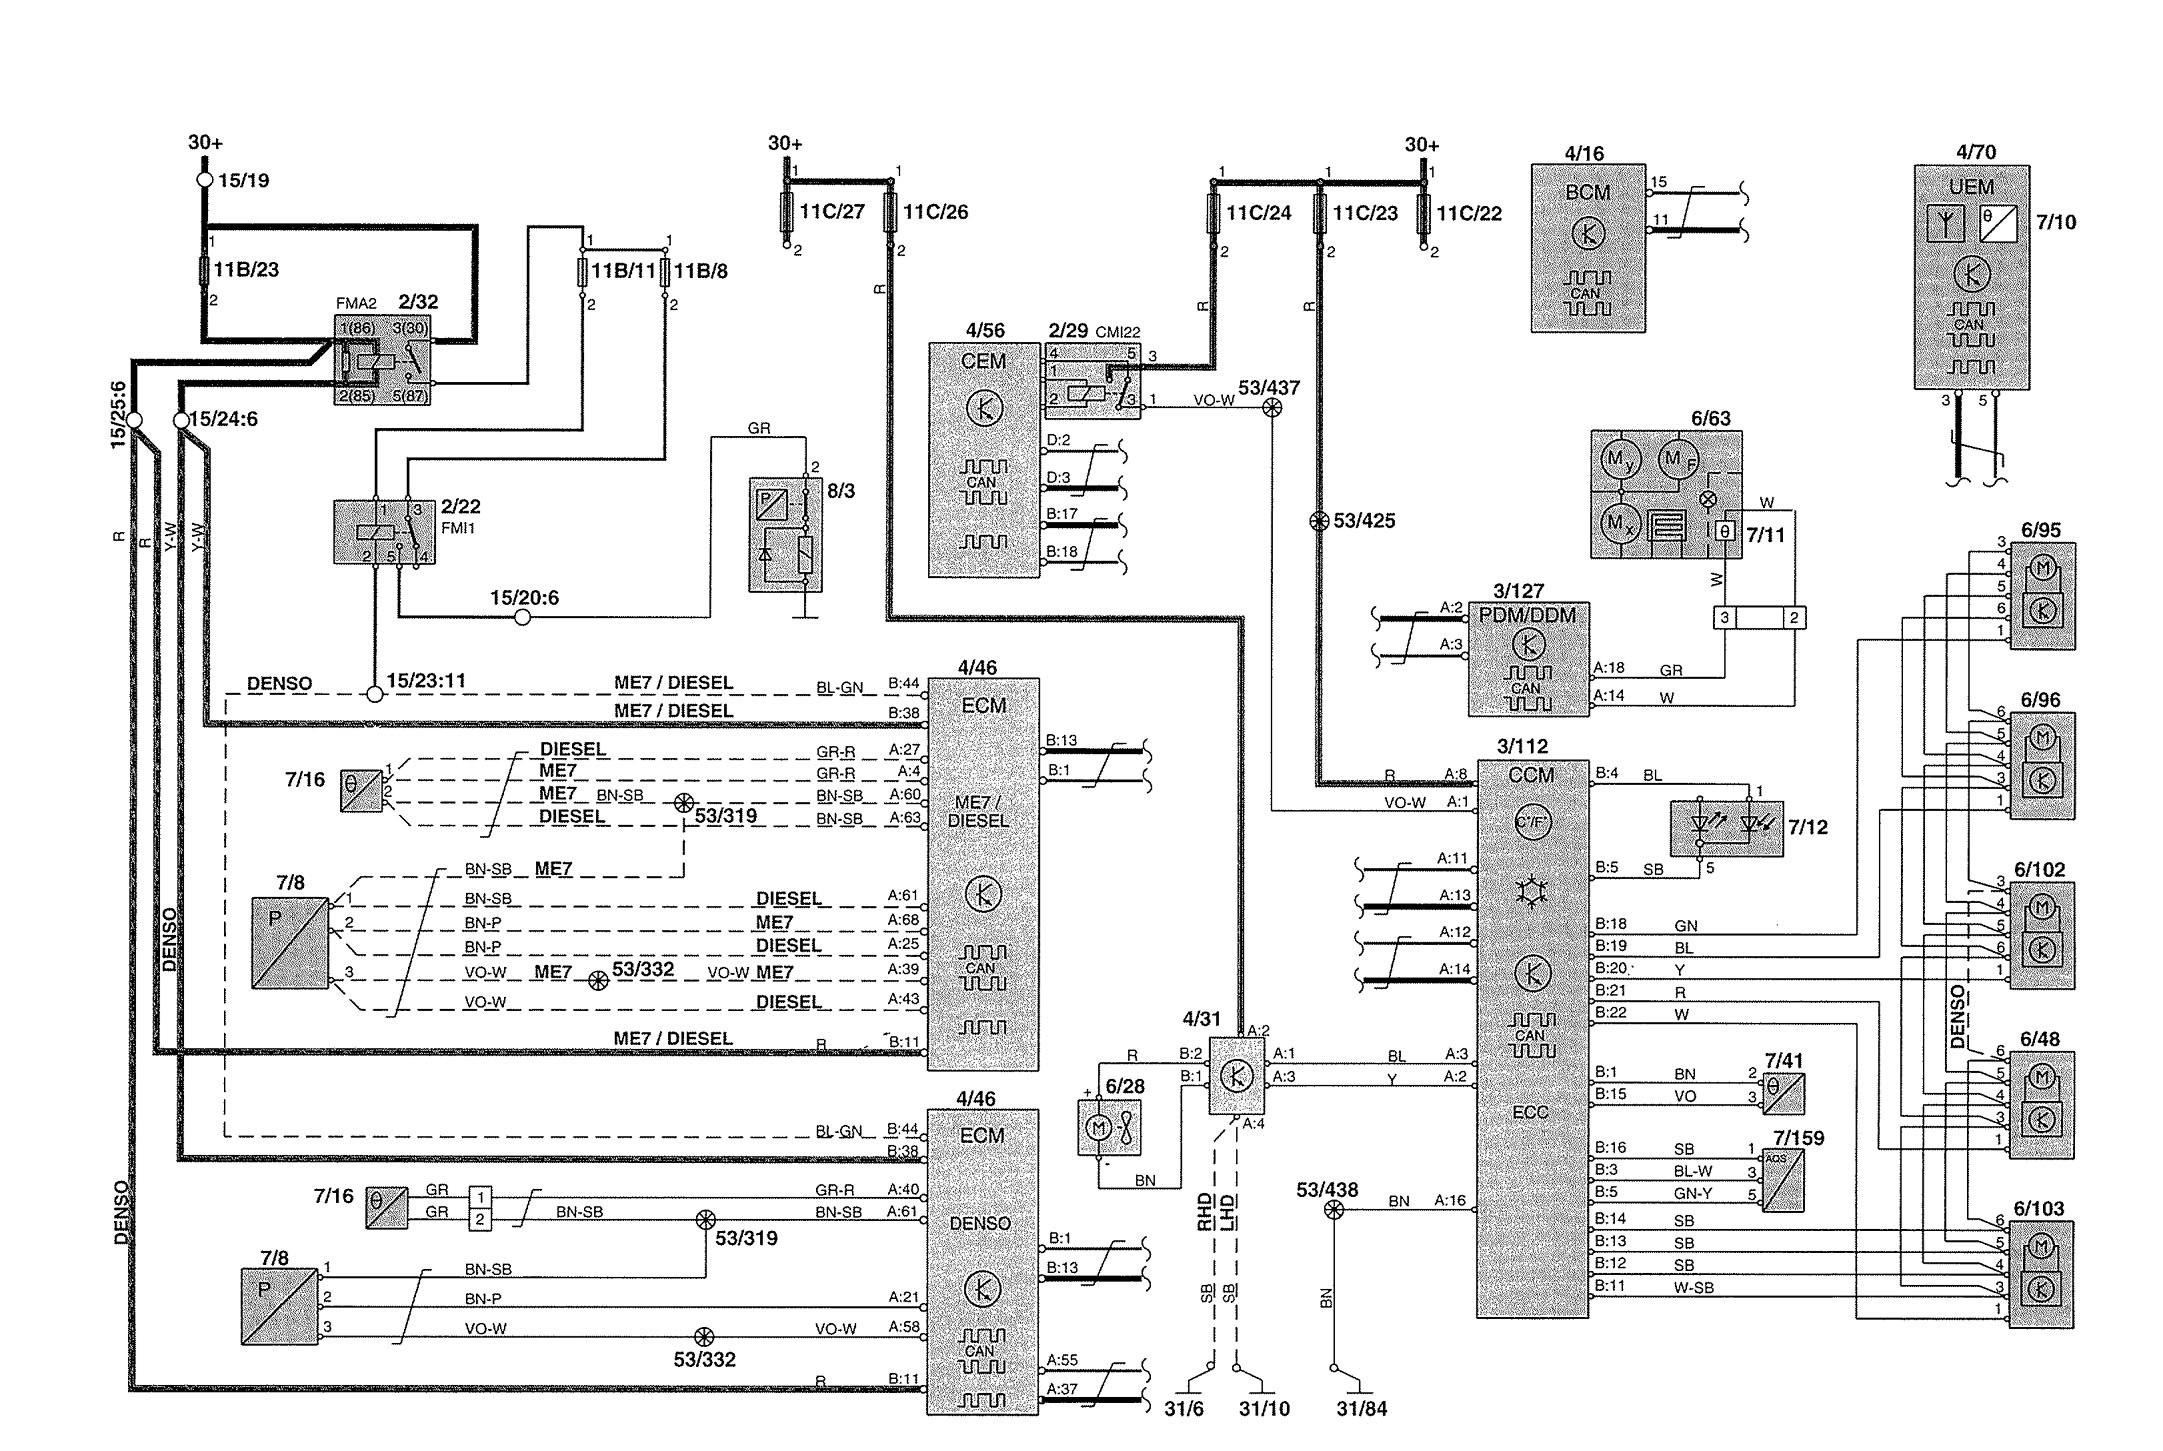 Eg 3457 Fog Light Relay Wiring Diagram Lzk Gallery Free Download